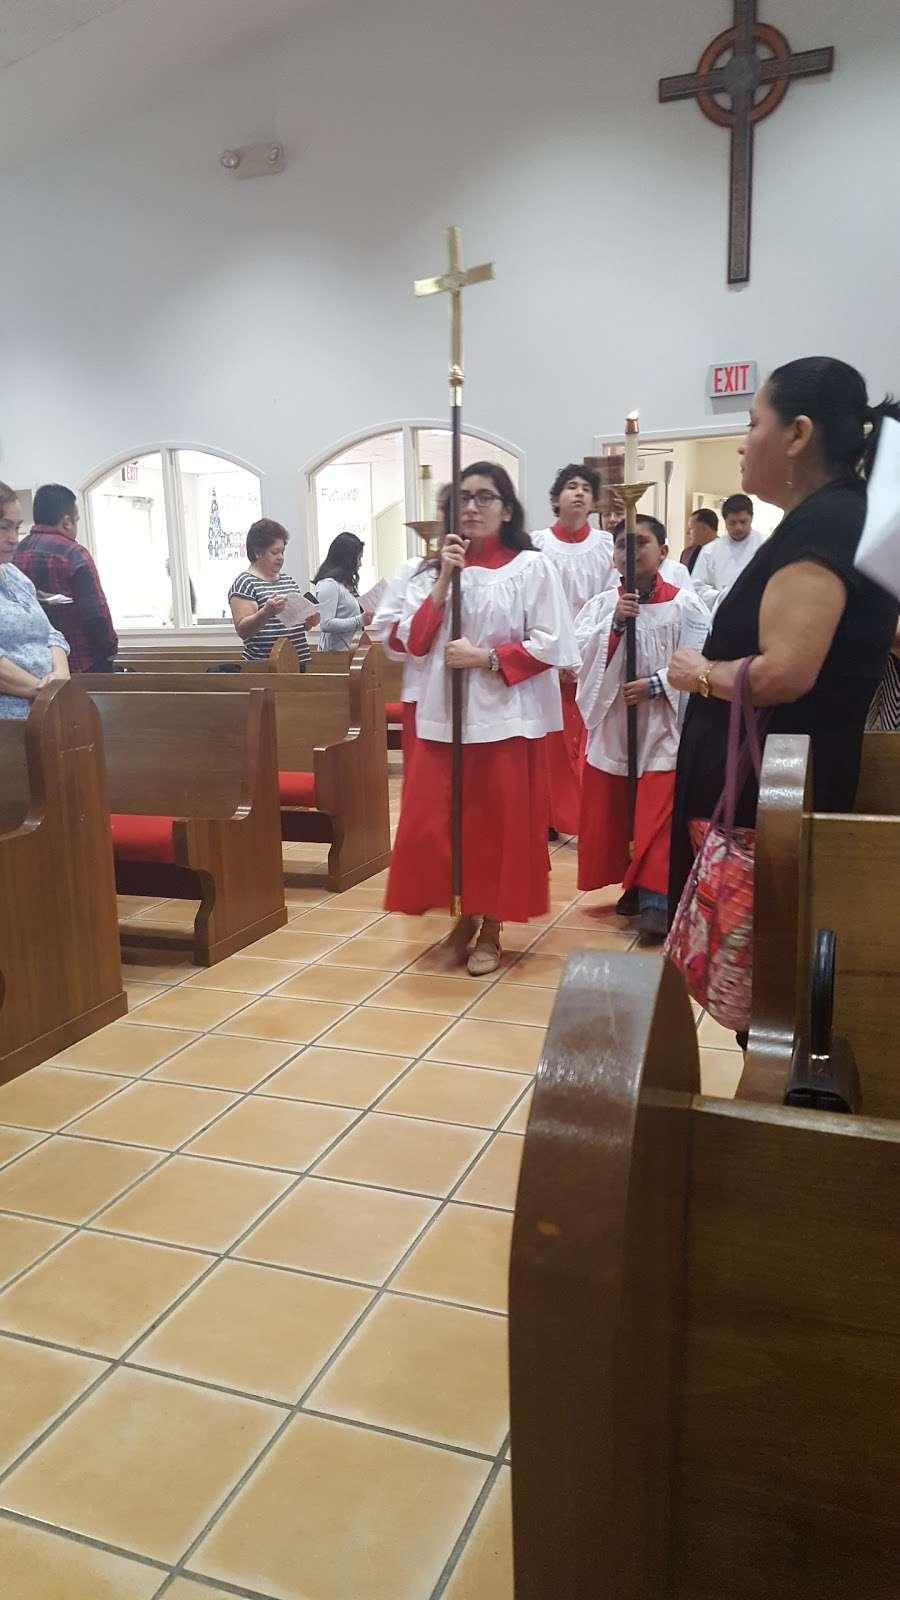 Santa Maria Virgen Episcopal Church - church    Photo 8 of 10   Address: 9600 Huntington Pl Dr, Houston, TX 77099, USA   Phone: (281) 879-6000